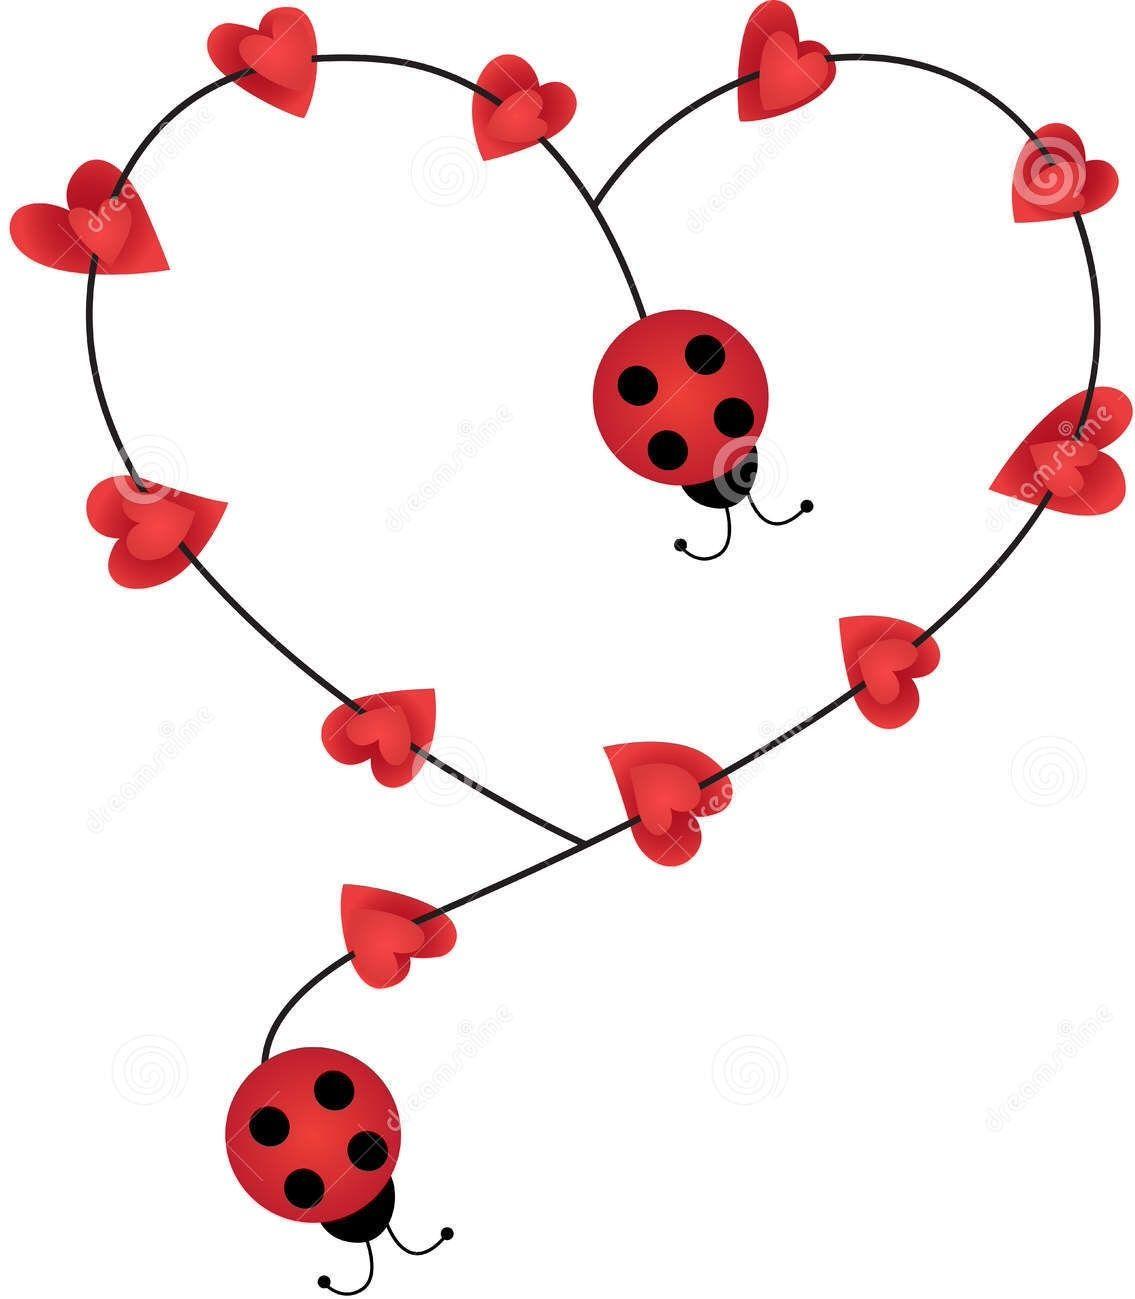 Ladybugs clipart valentine. Dreamstime com ladybug art